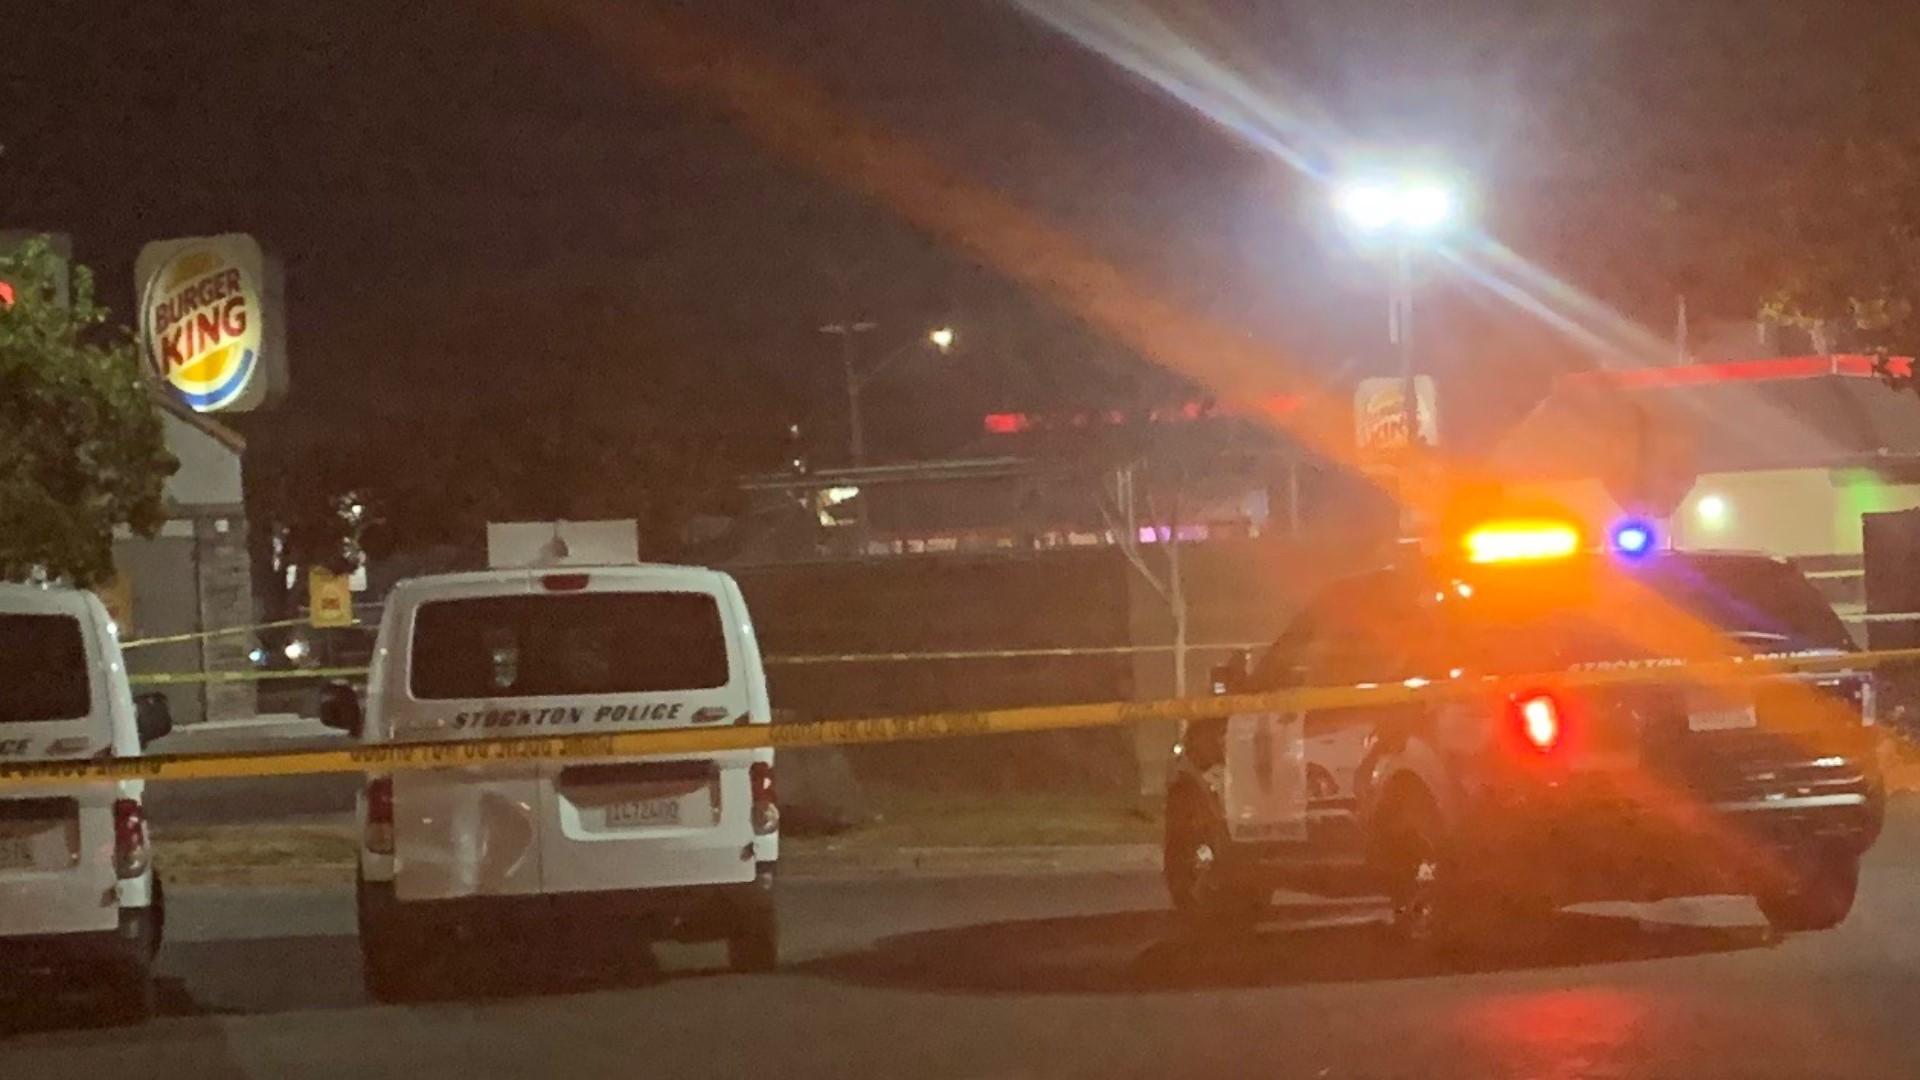 Stockton Boy 15 Shot Killed In Drive Thru At Burger King Abc10 Com